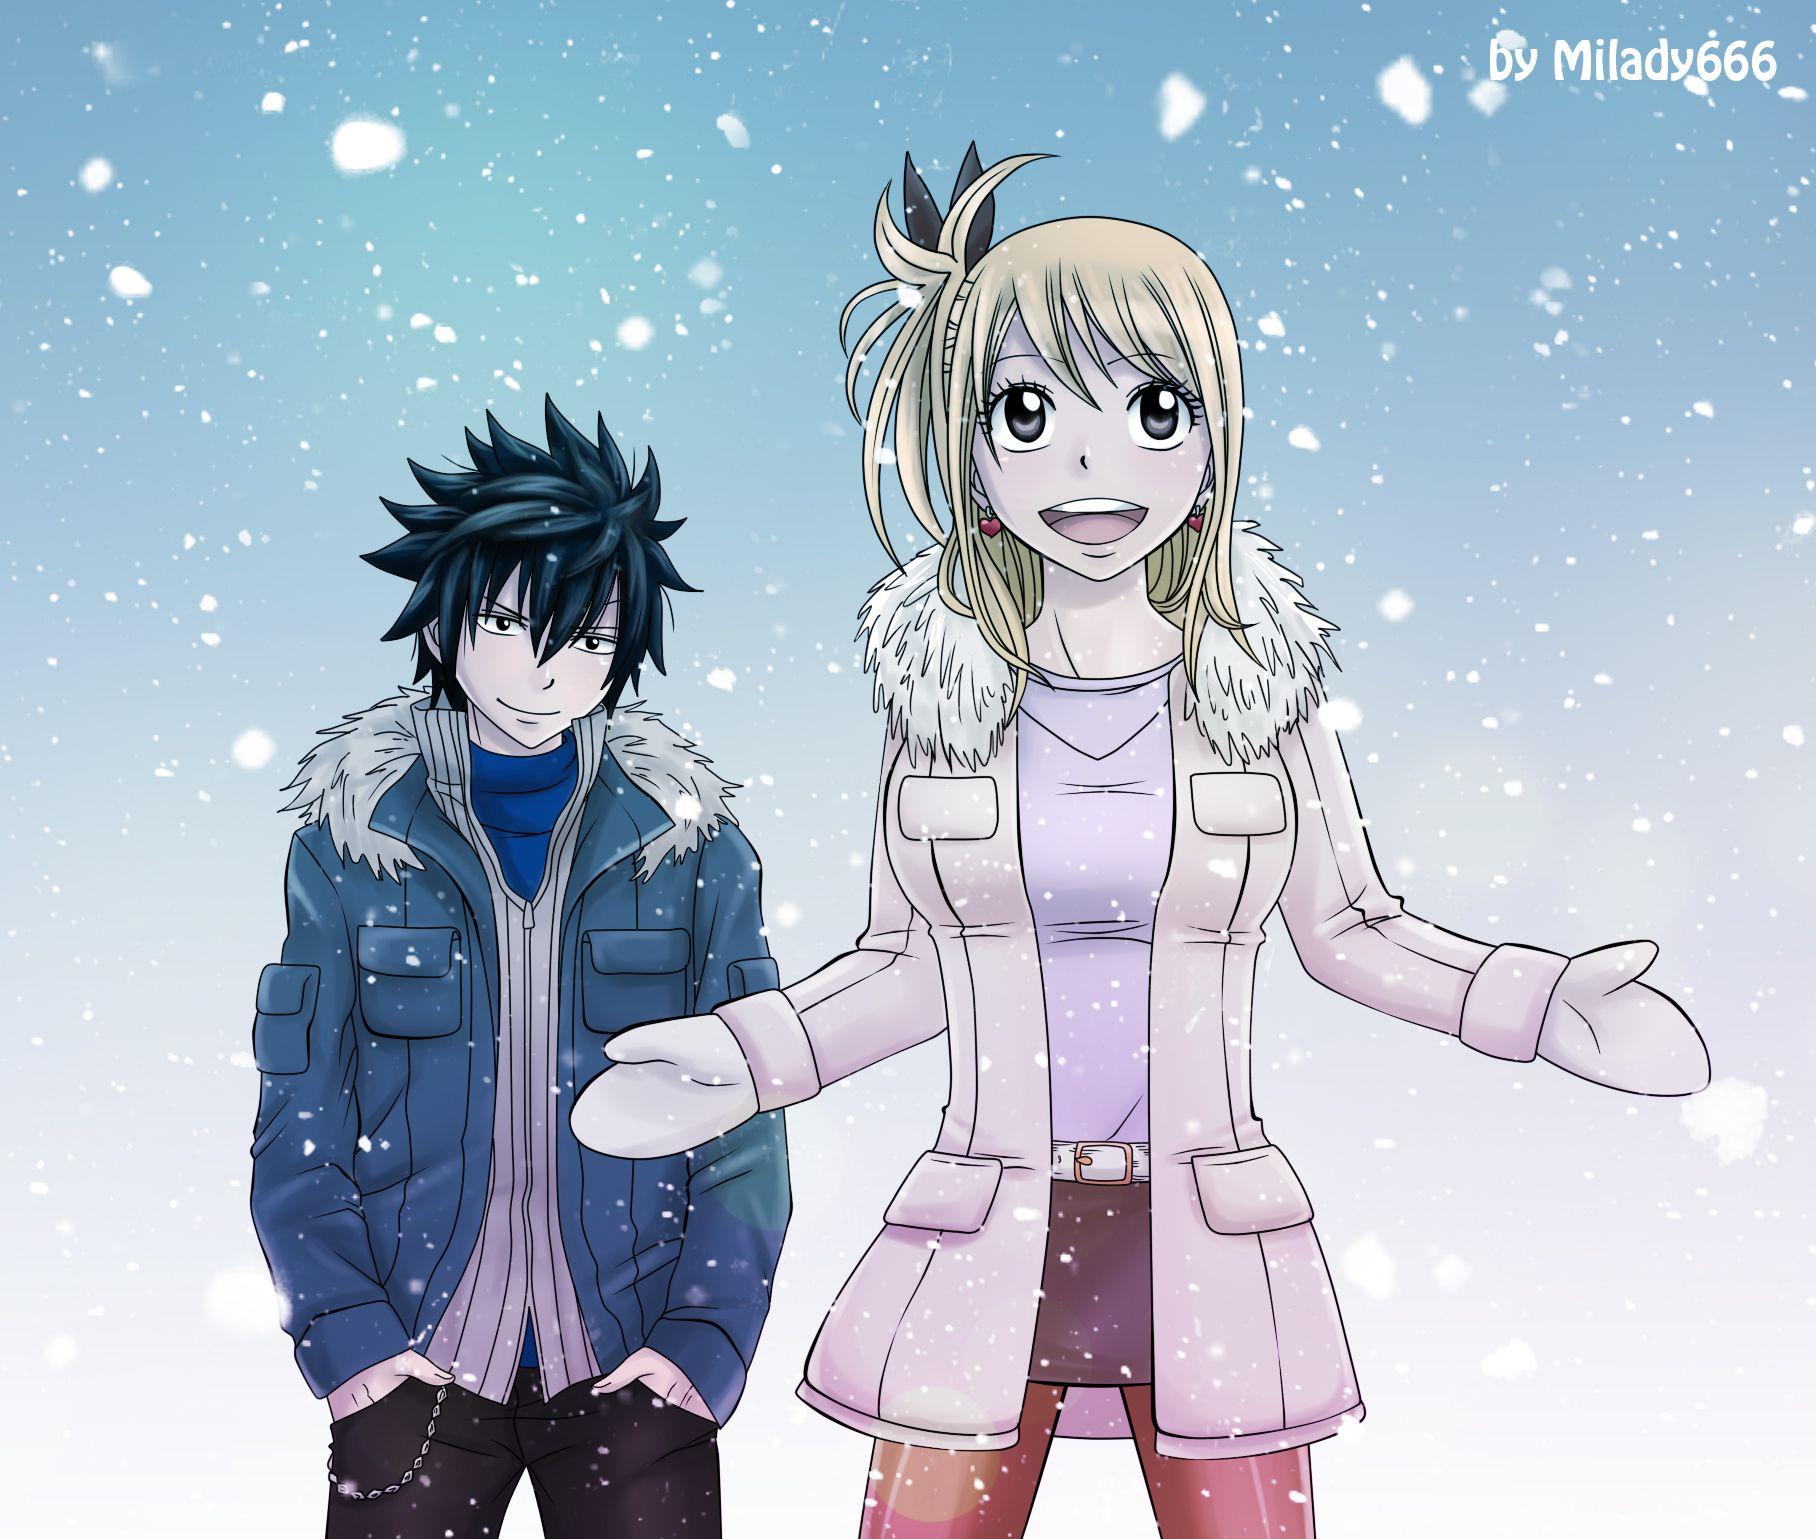 Élégant Dessin A Imprimer Manga Fairy Tail